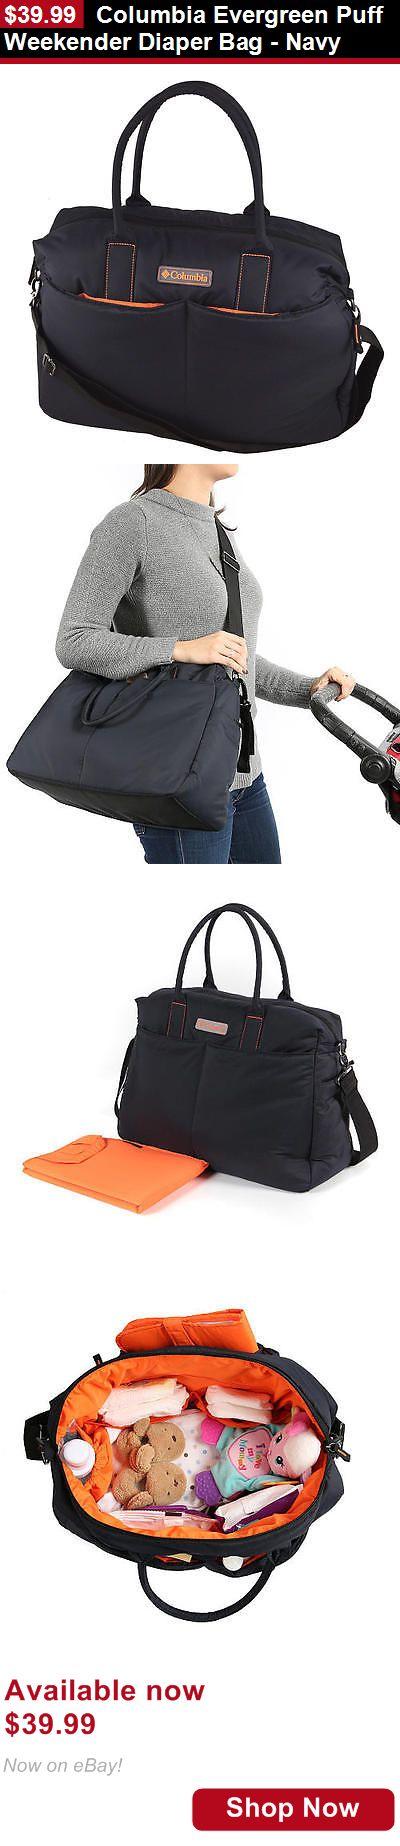 Baby Diaper Bags: Columbia Evergreen Puff Weekender Diaper Bag - Navy BUY IT NOW ONLY: $39.99